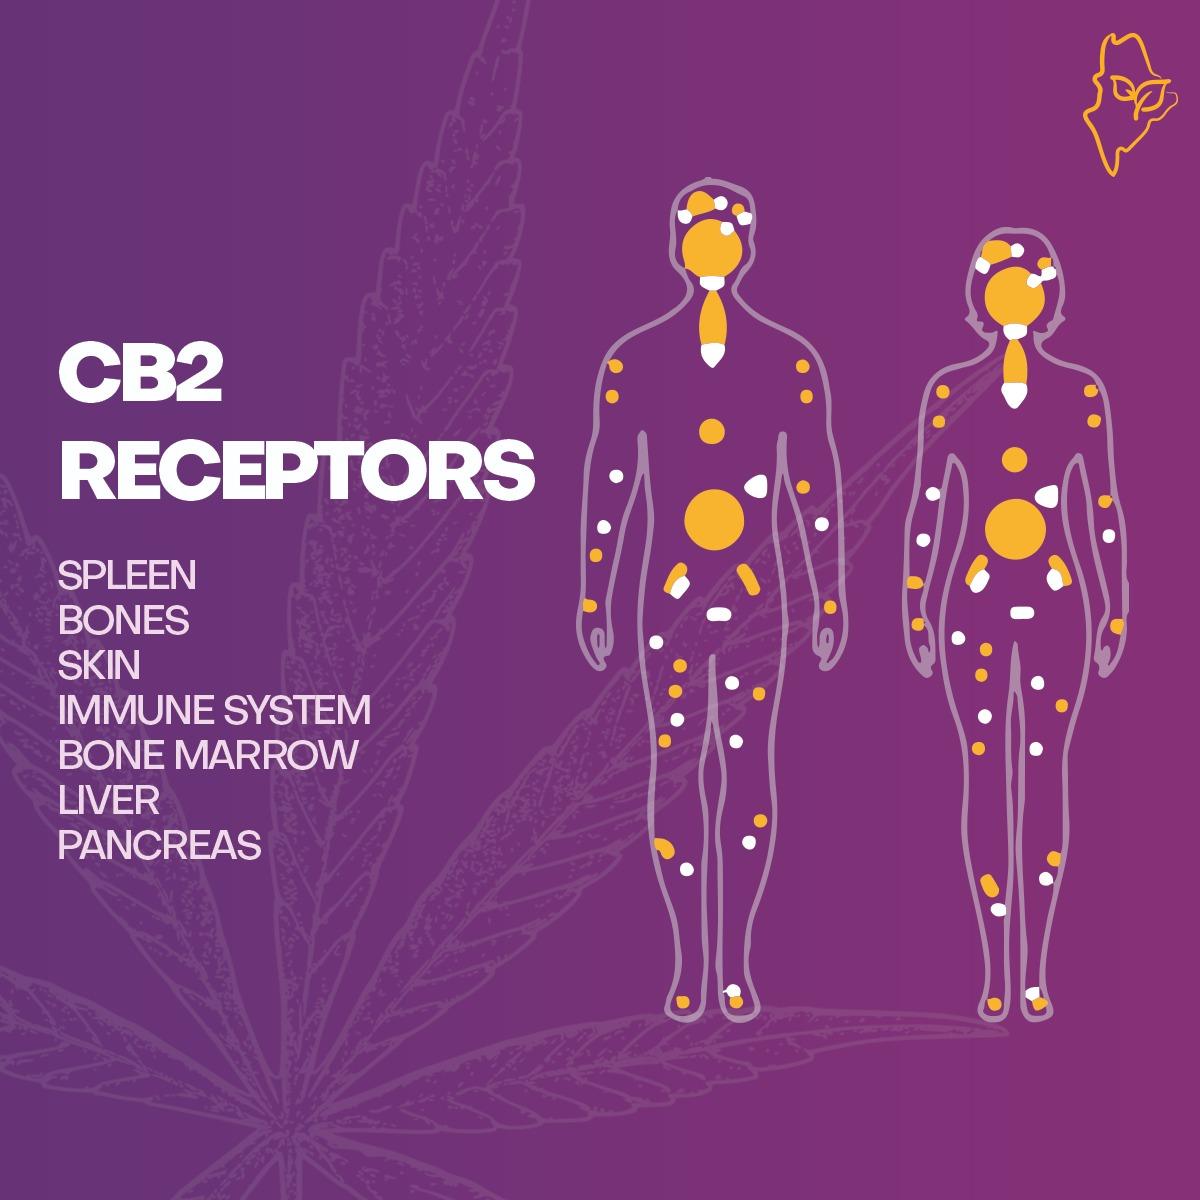 CB2 Receptor and our endocannabinoid sytems